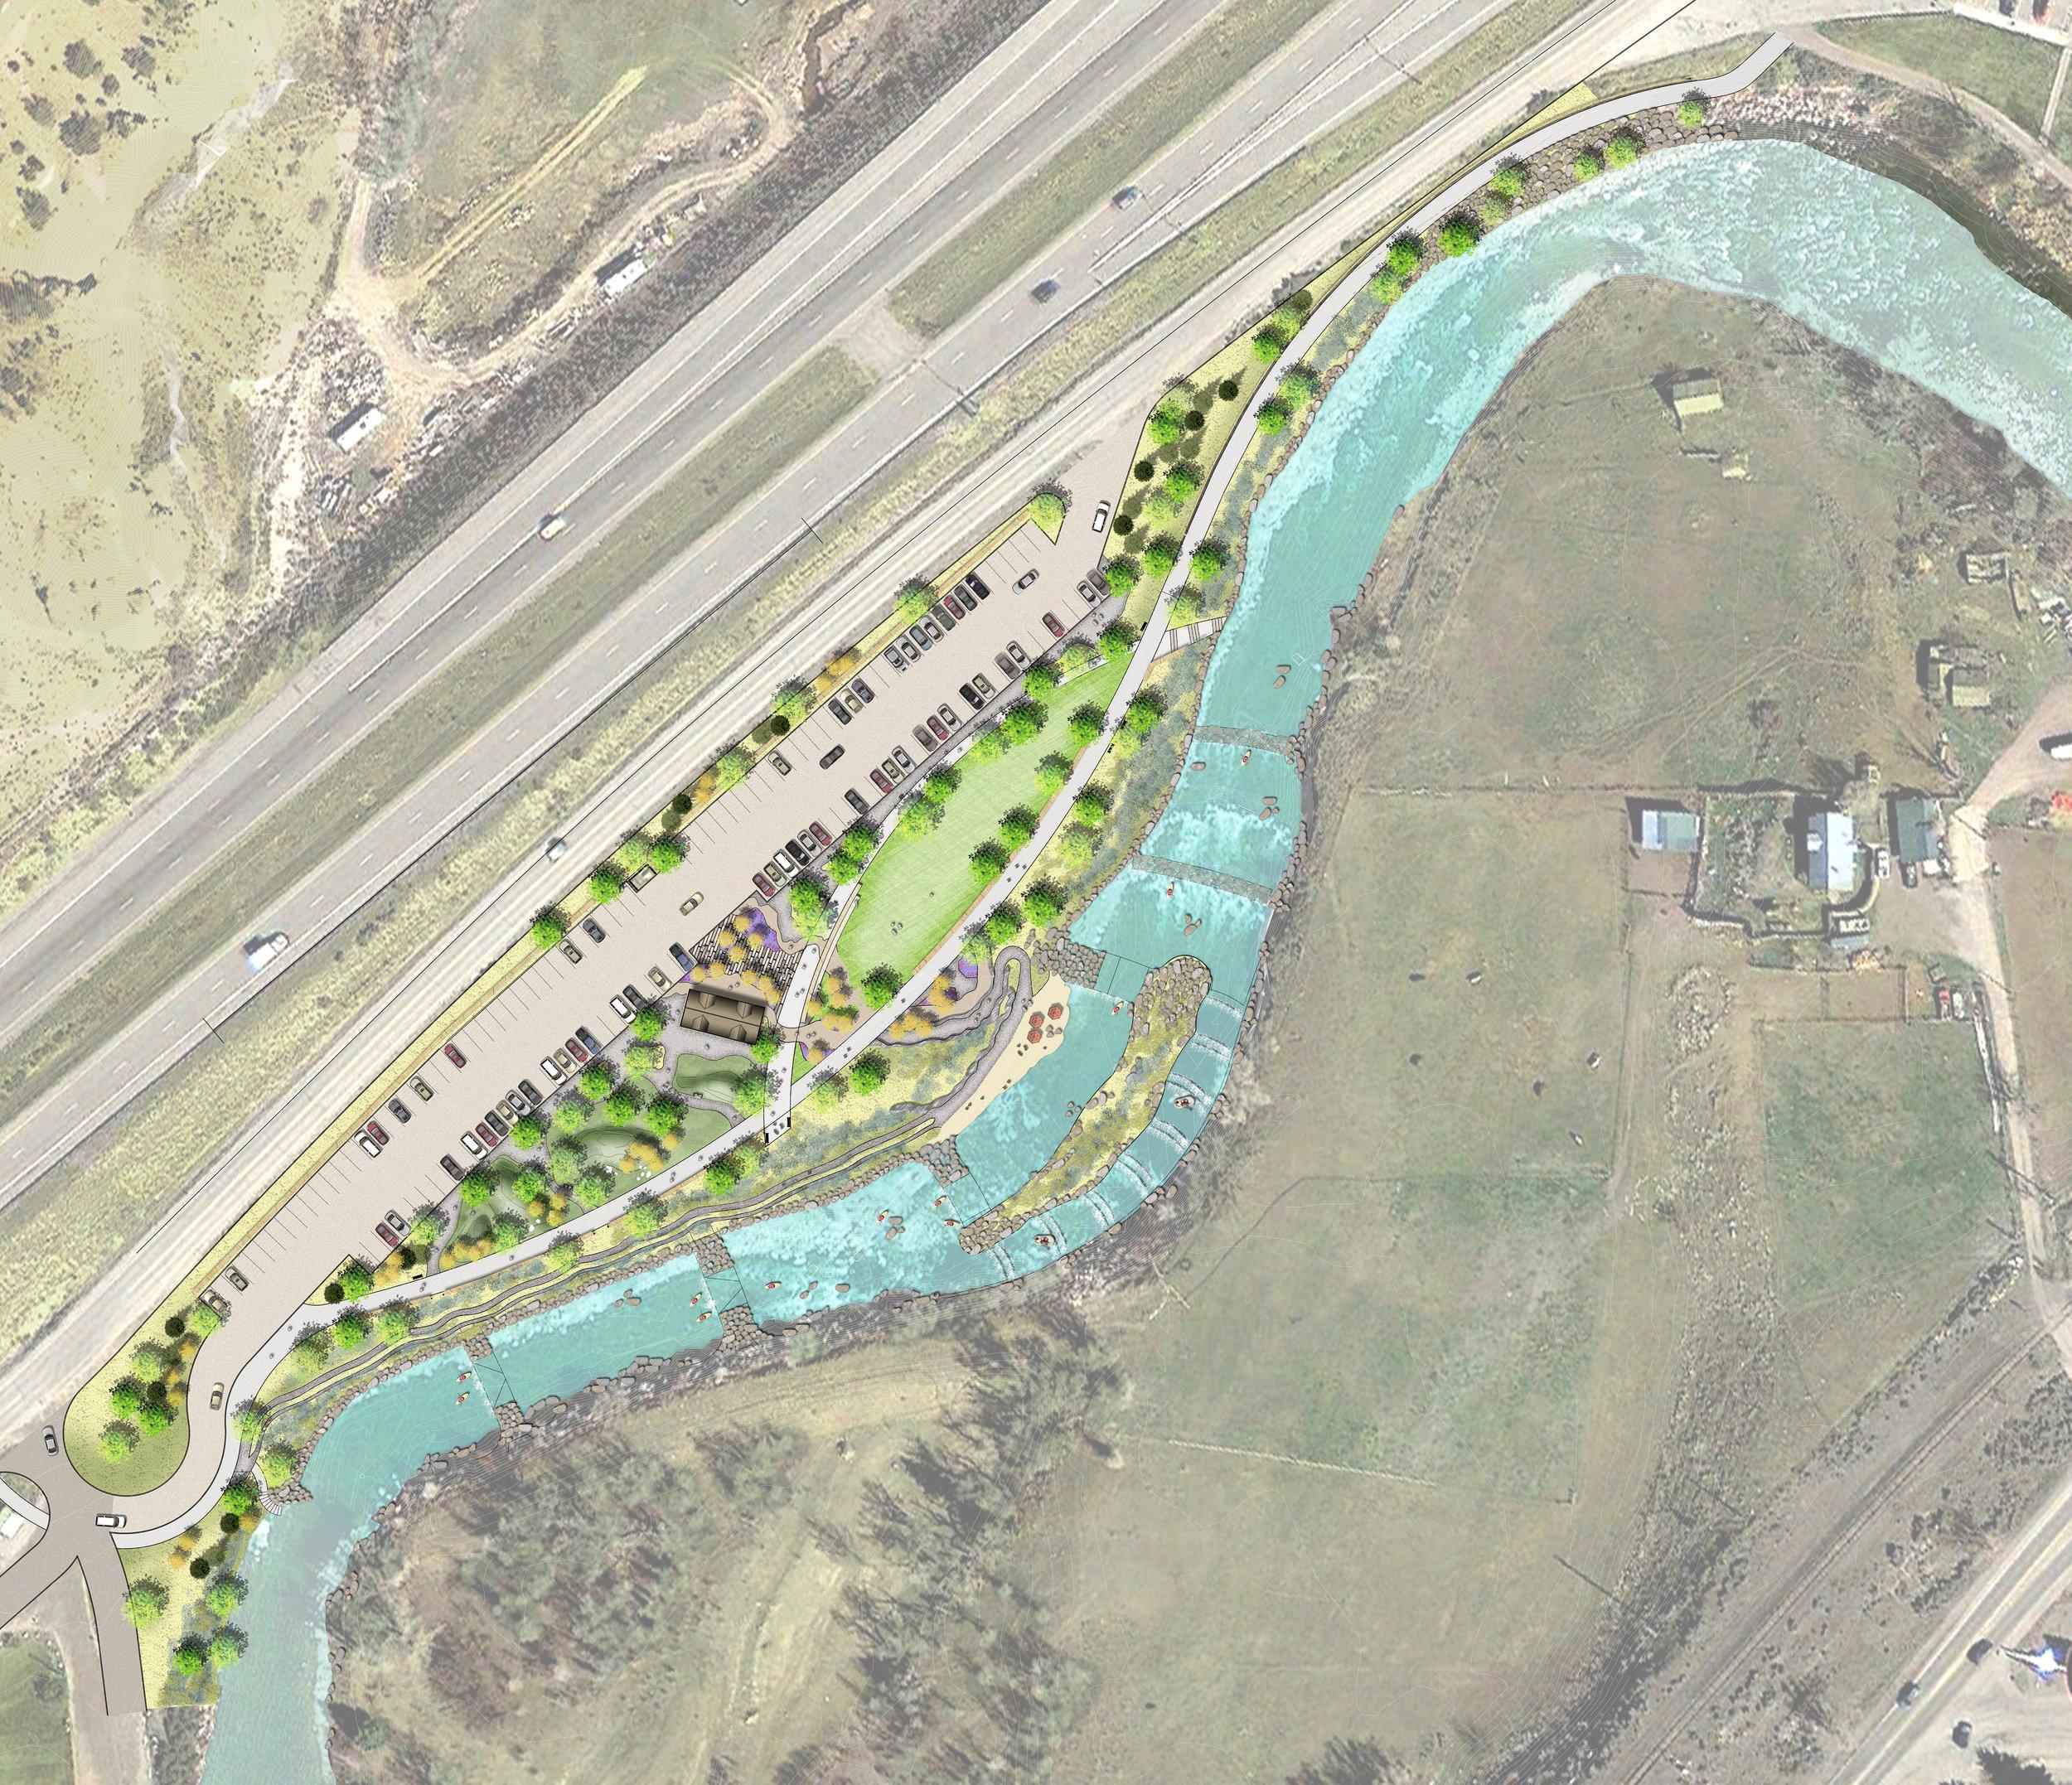 "<img src=""  studioINSITE_Eagle_River_Park_I-70_Perspective  ""alt=""Master Plan, River Corridor, Pedestrian Bridge, Whitewater park, Trail System, Conservation, Mountain Community, Eagle Colorado, Town of Eagle, Eagle River Park, I-70 Corridor,  "" title=""Eagle River Corridor Master Plan  ""/>"